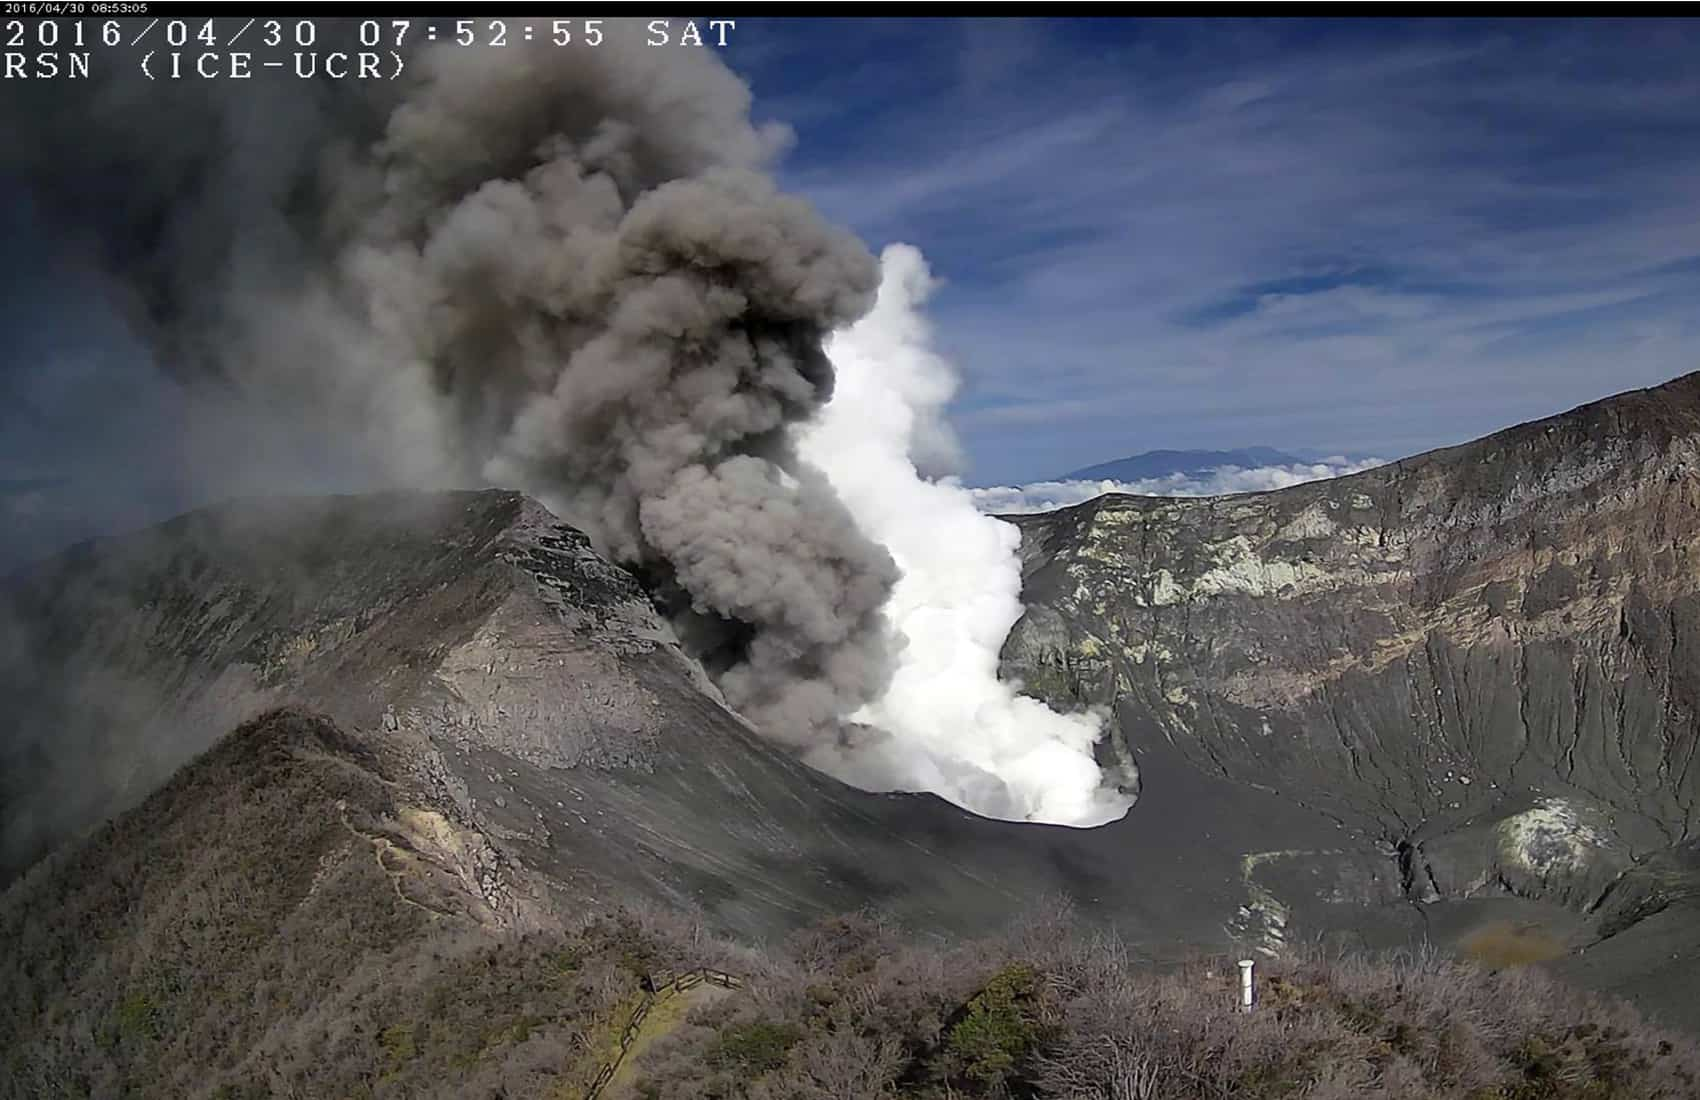 Ash, vapor explosions at Turrialba Volcano. April 30, 2016.